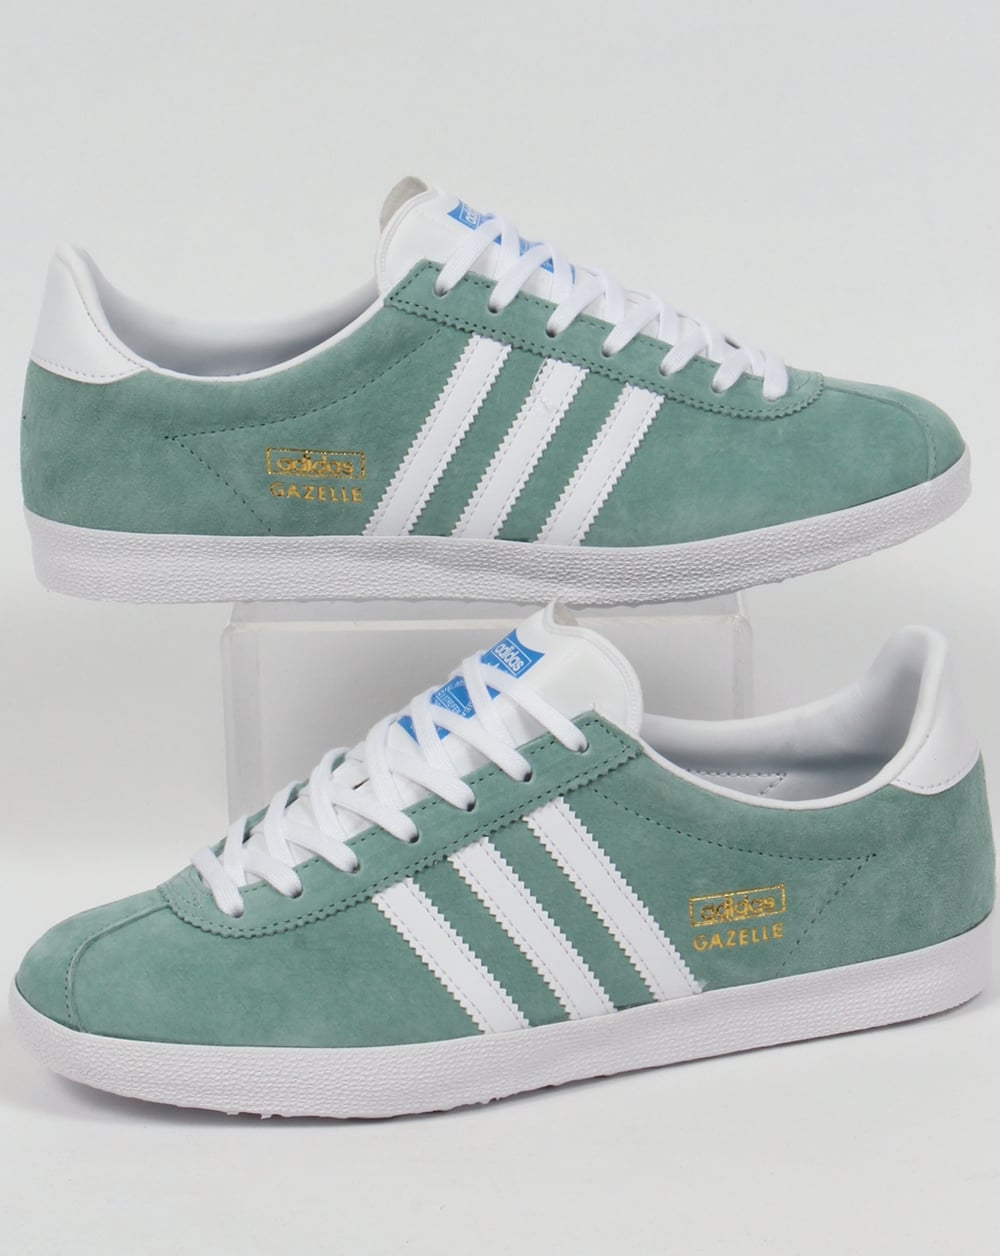 Adidas Gazelle OG Trainers Legend Green/White